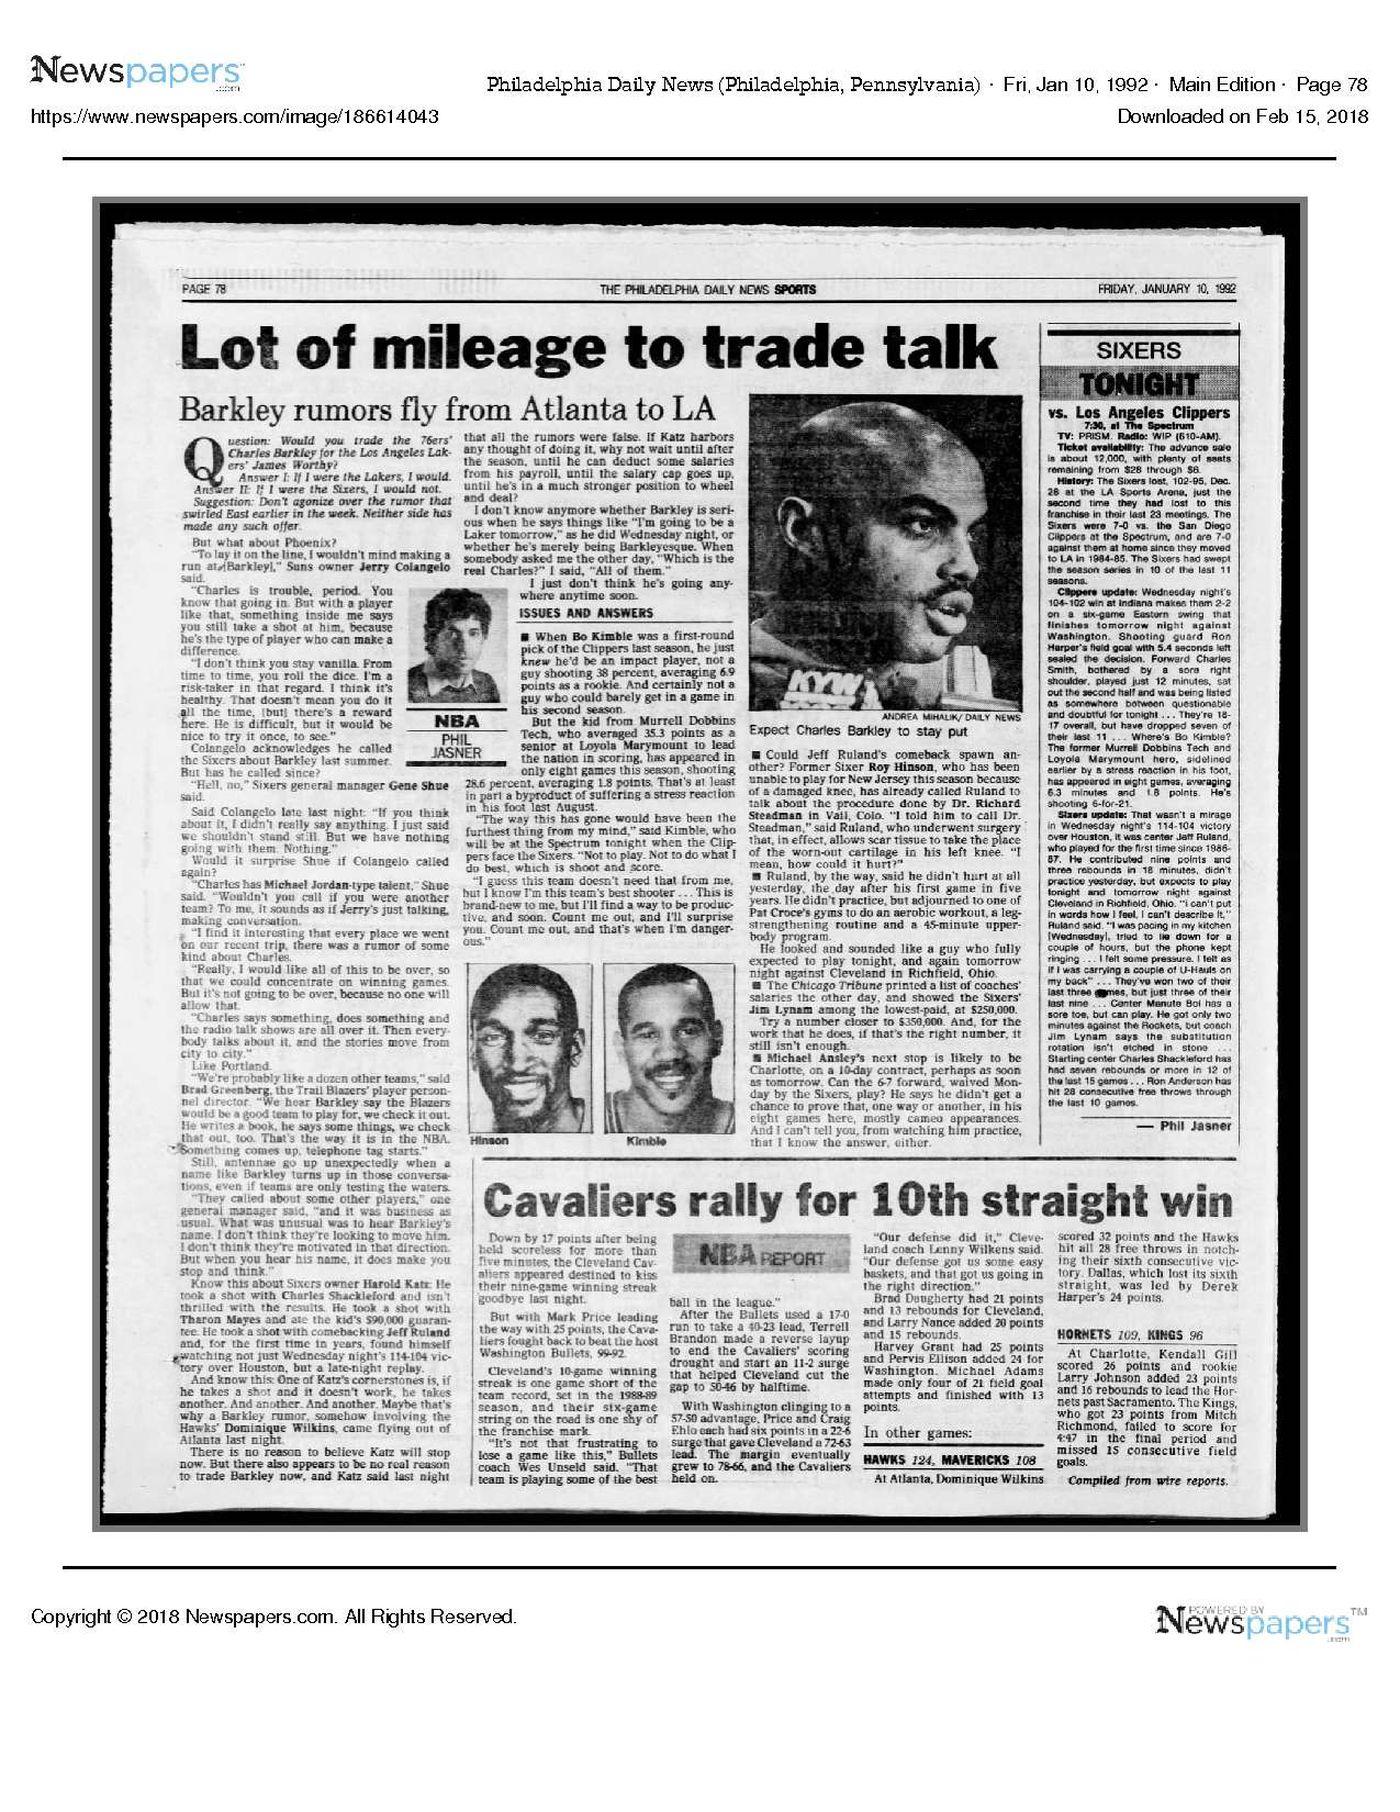 ebfb11d19388 Rumors followed Charles Barkley throughout the 1991-92 season